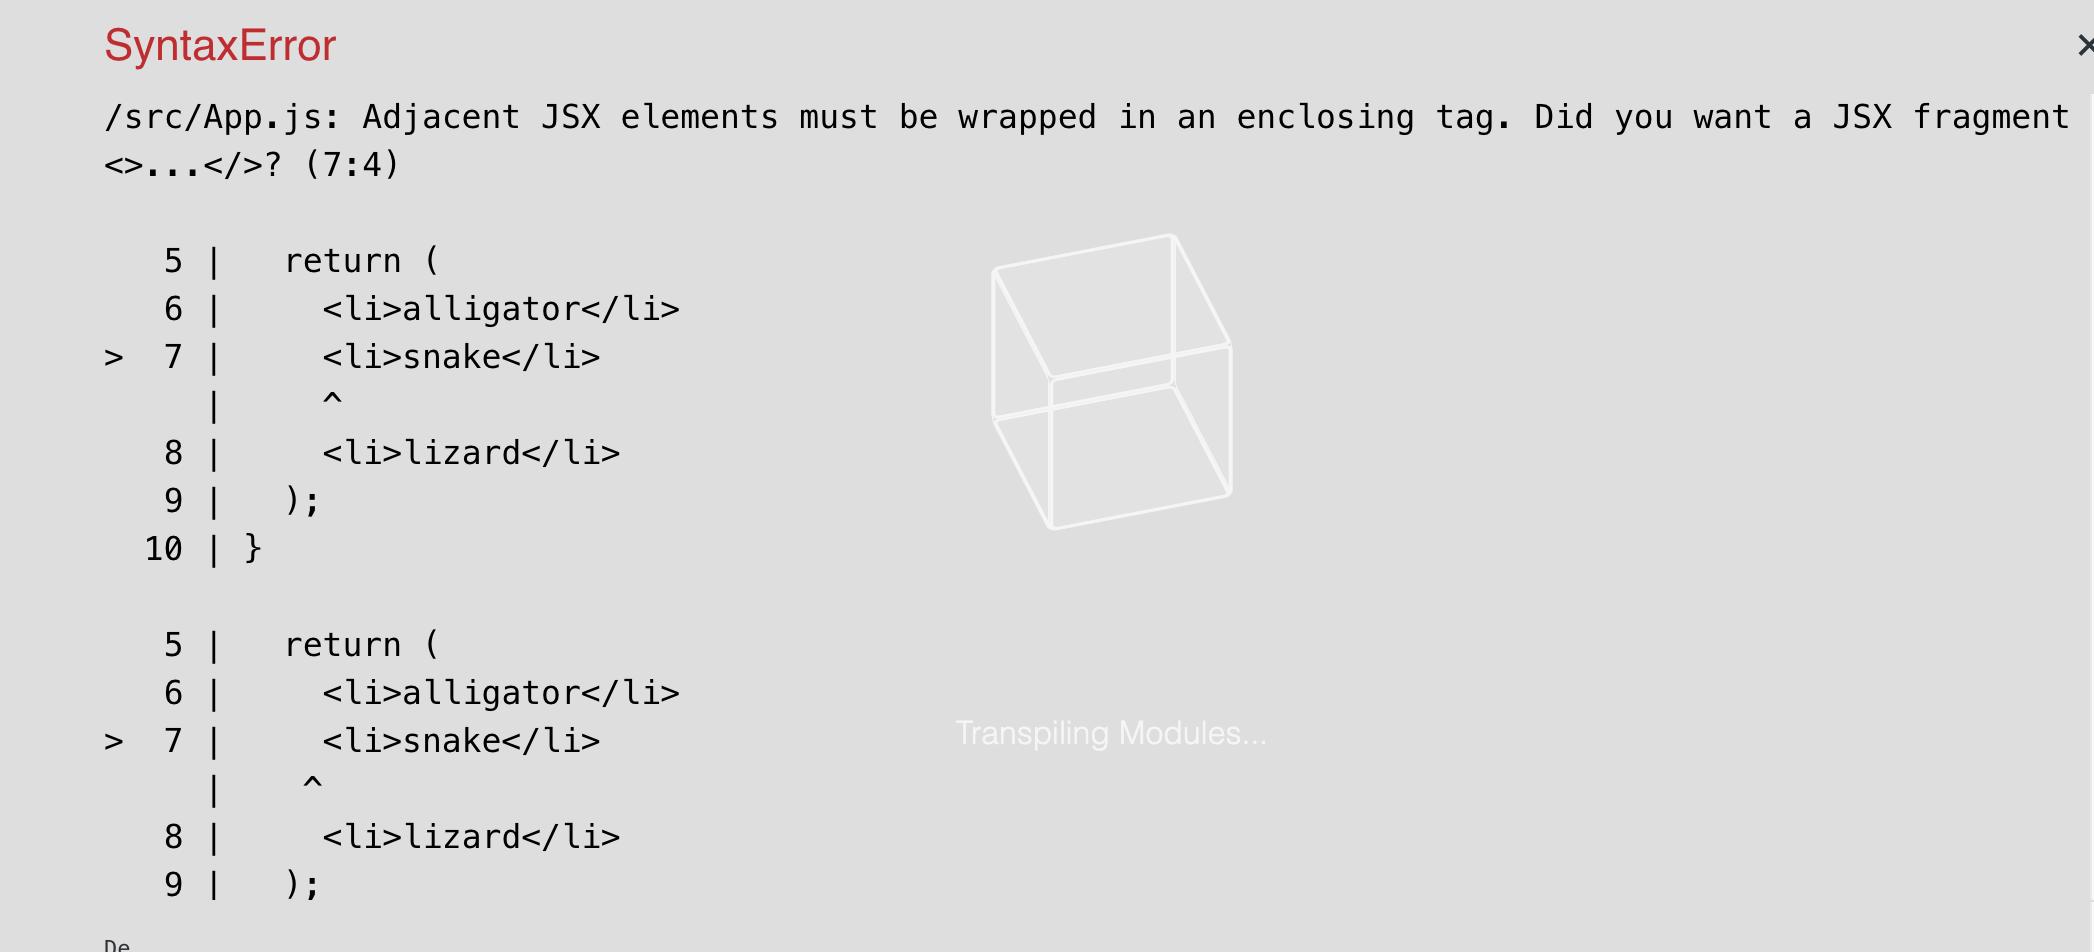 Hard error from React for Adjacent JSX elements